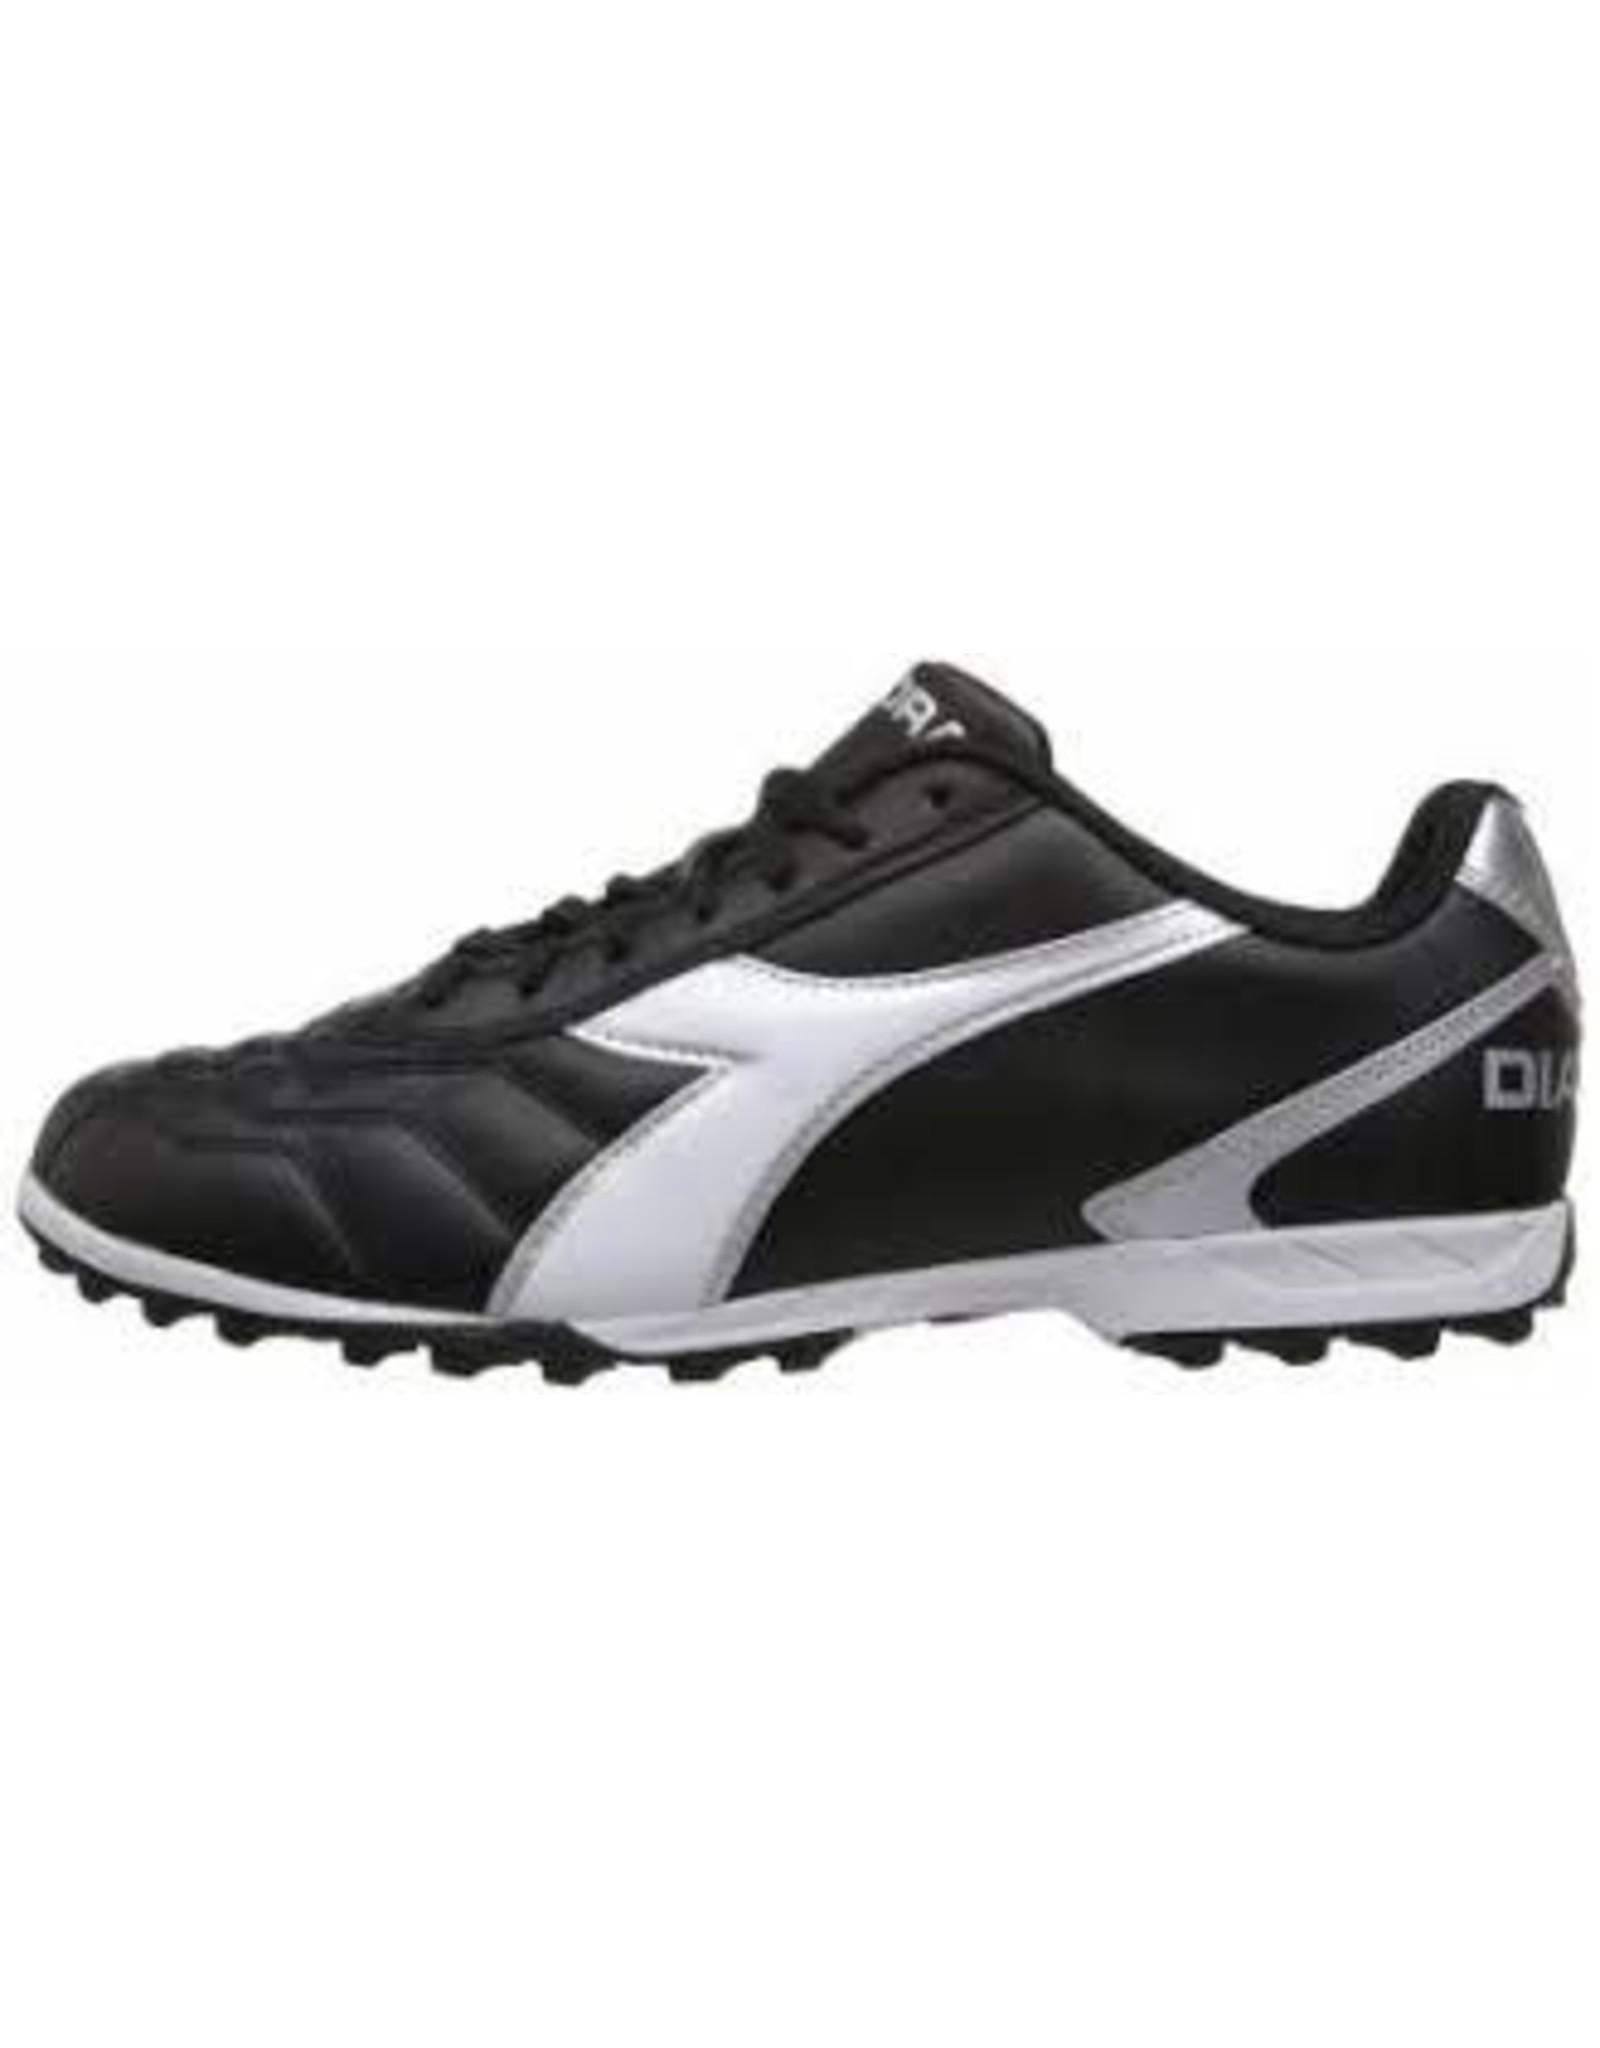 Diadora Diadora Clasico Aris TF Junior Shoes (Black/White)